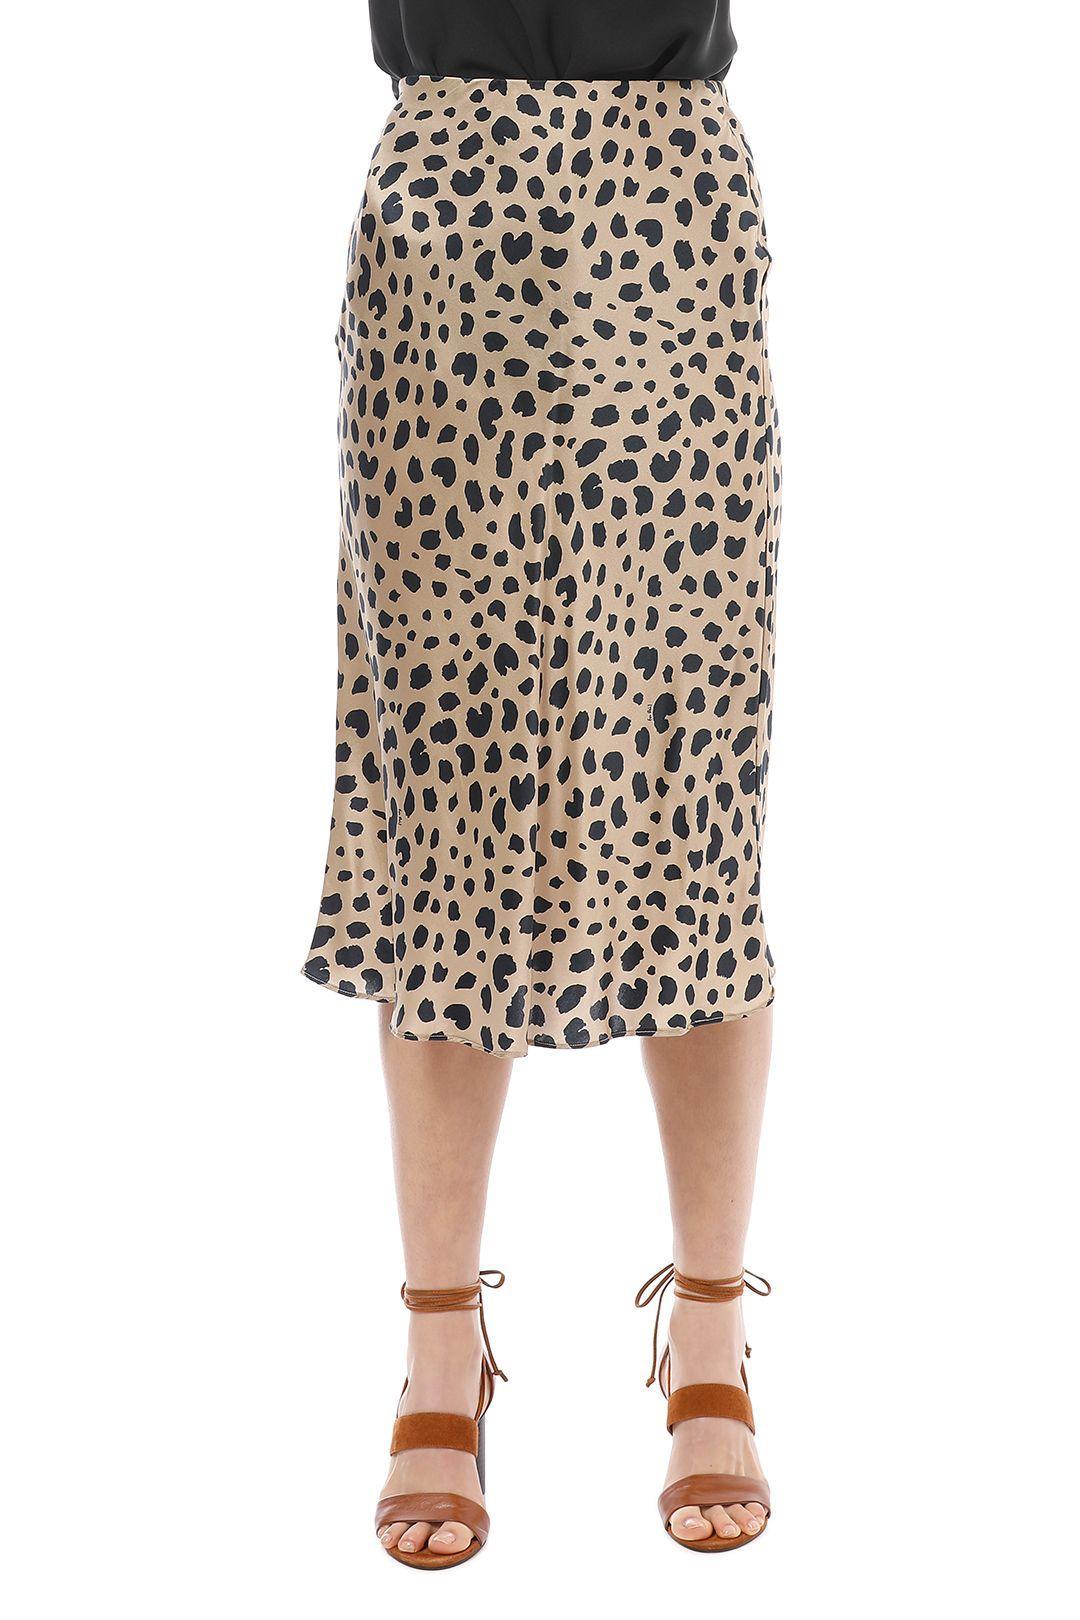 Realisation Par - Naomi Wild Things - Leopard - Front Detail